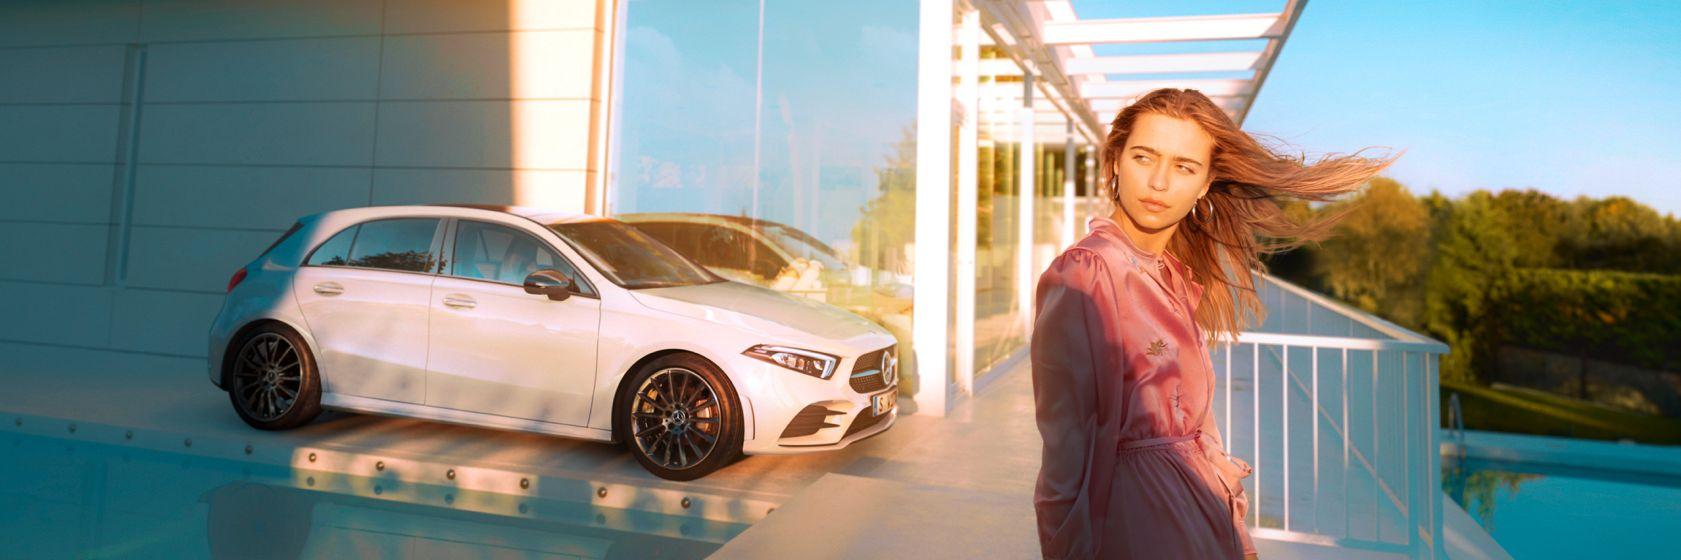 Інтер'єр та екстер'єр Mercedes–Benz A-Class